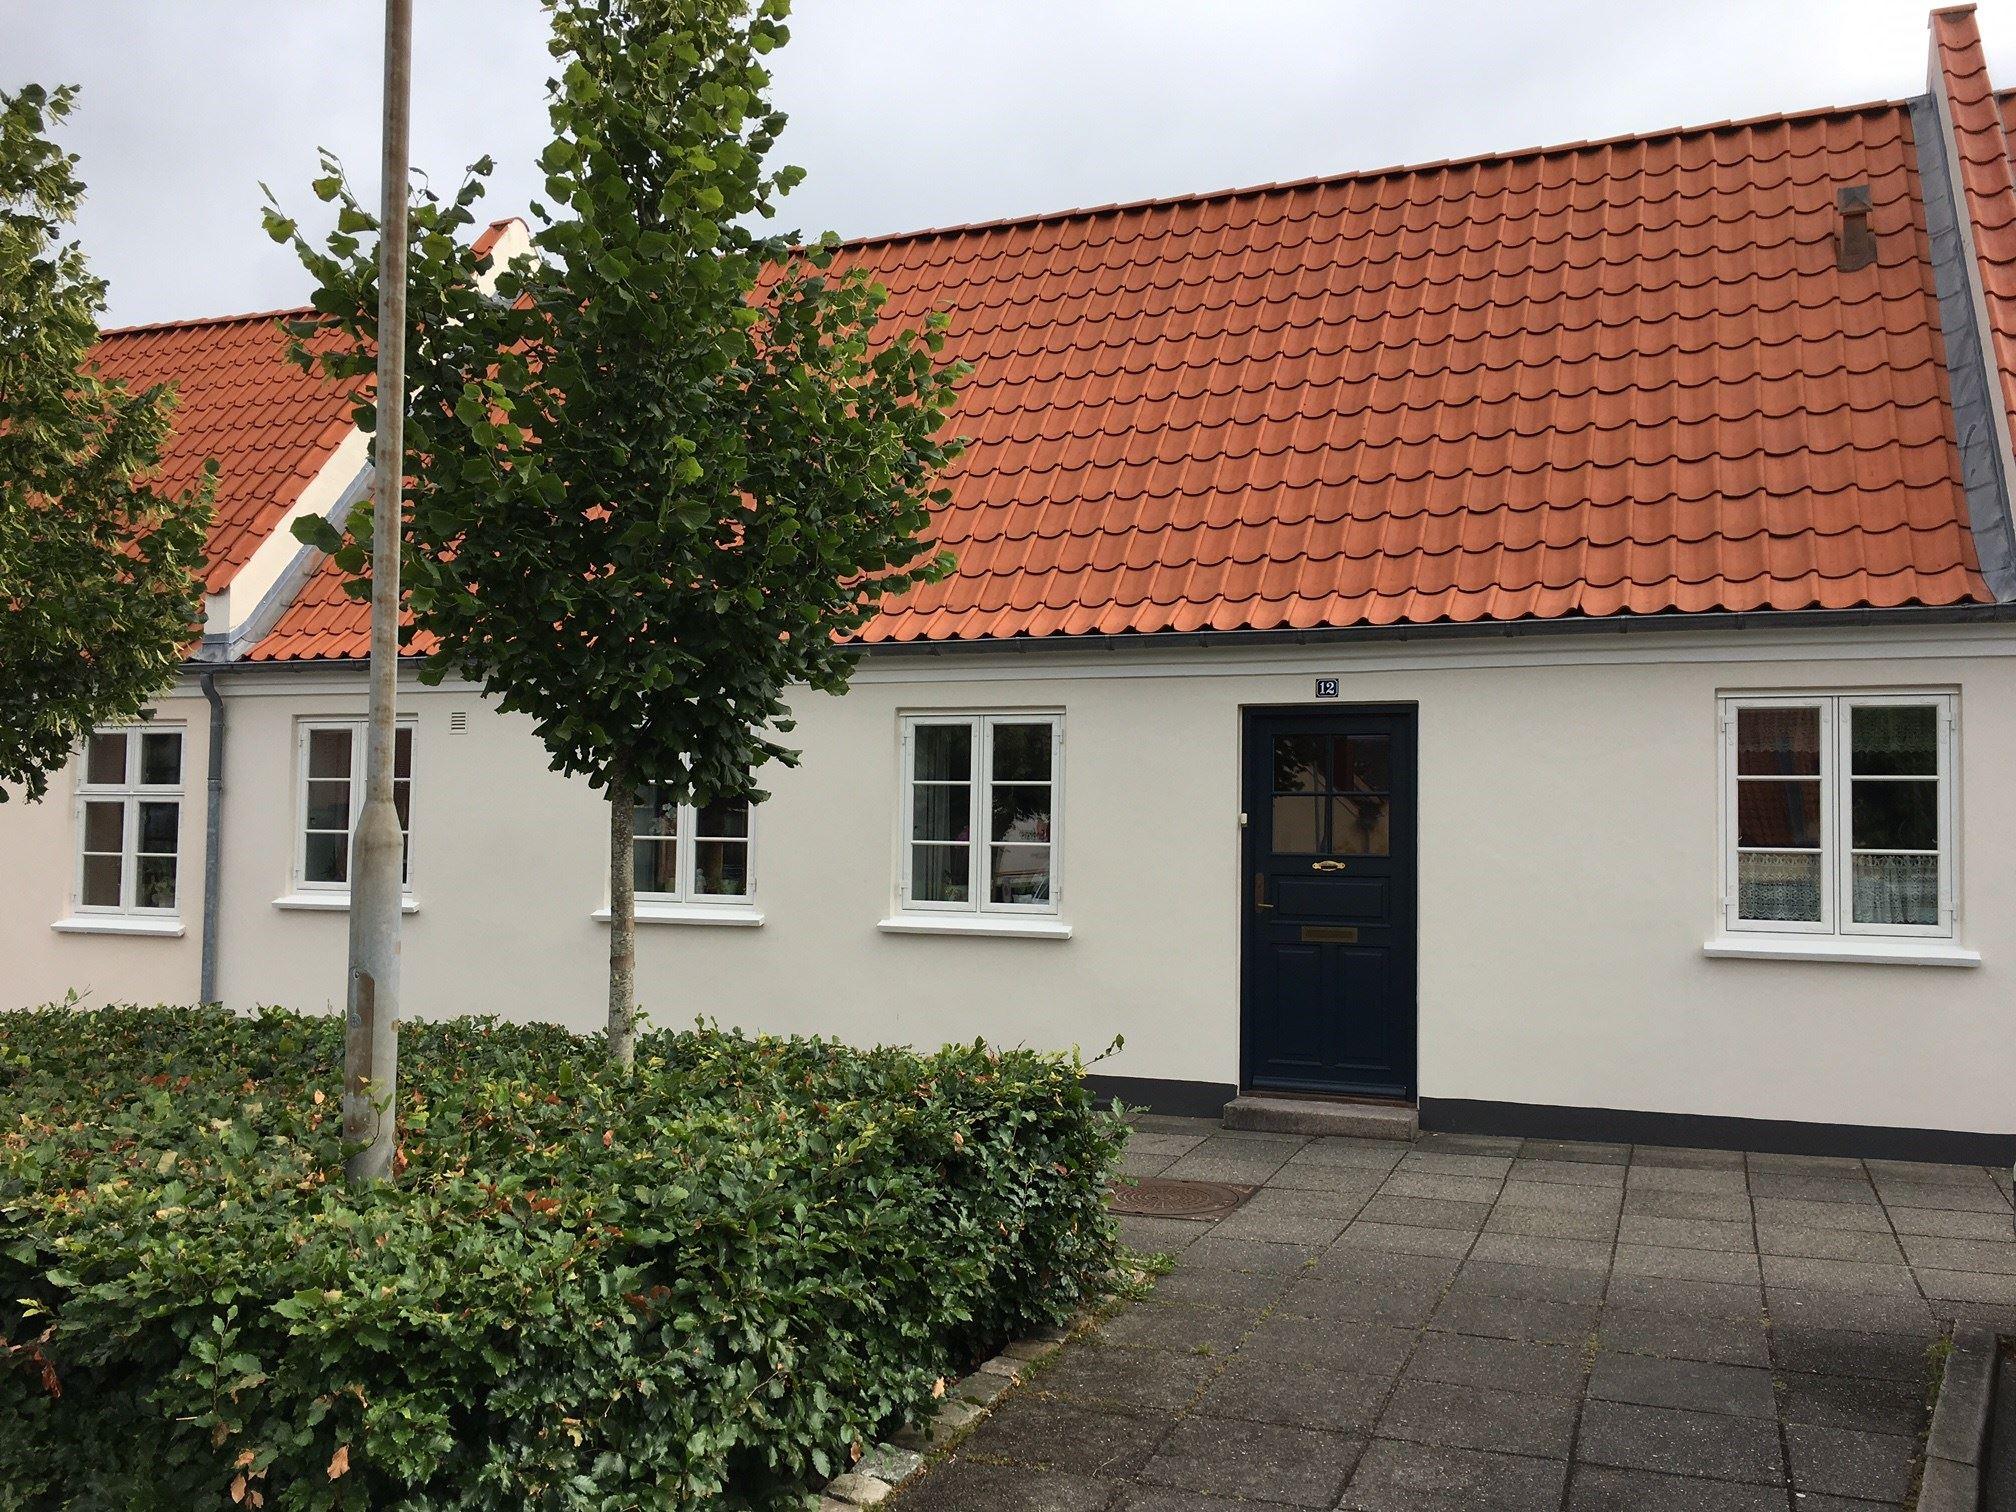 Murtfeldts Plads 12, 6800 Varde